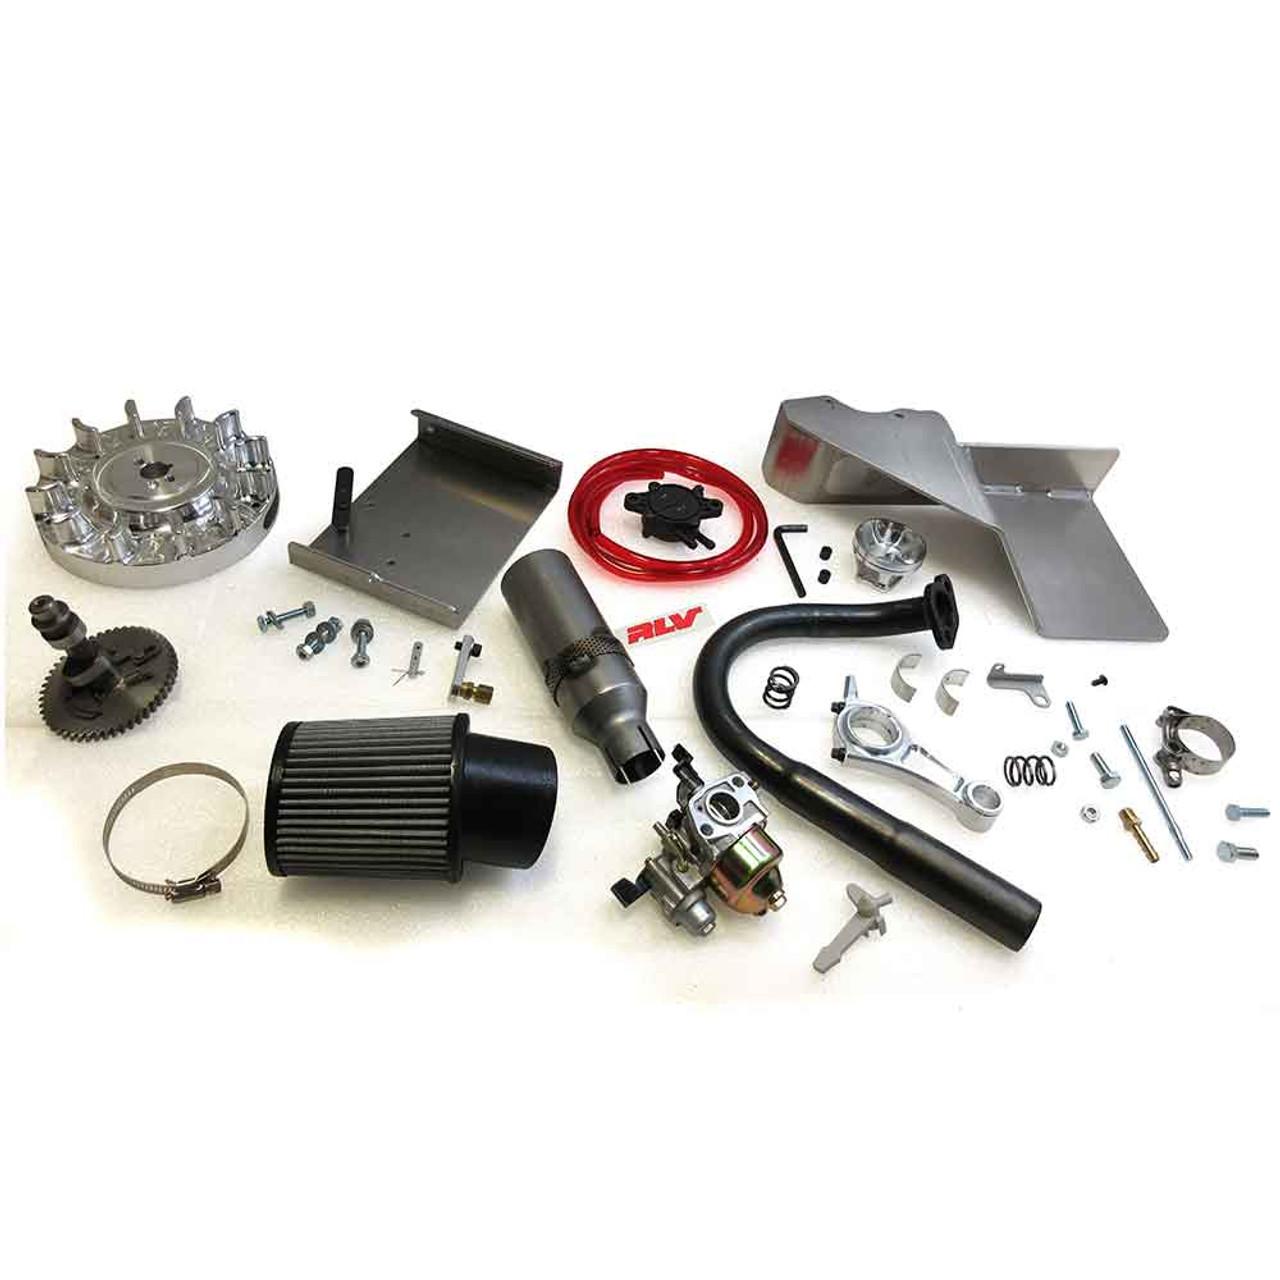 14-15HP+ - Builder Prepared Parts Kit, Predator 212 Gen 1